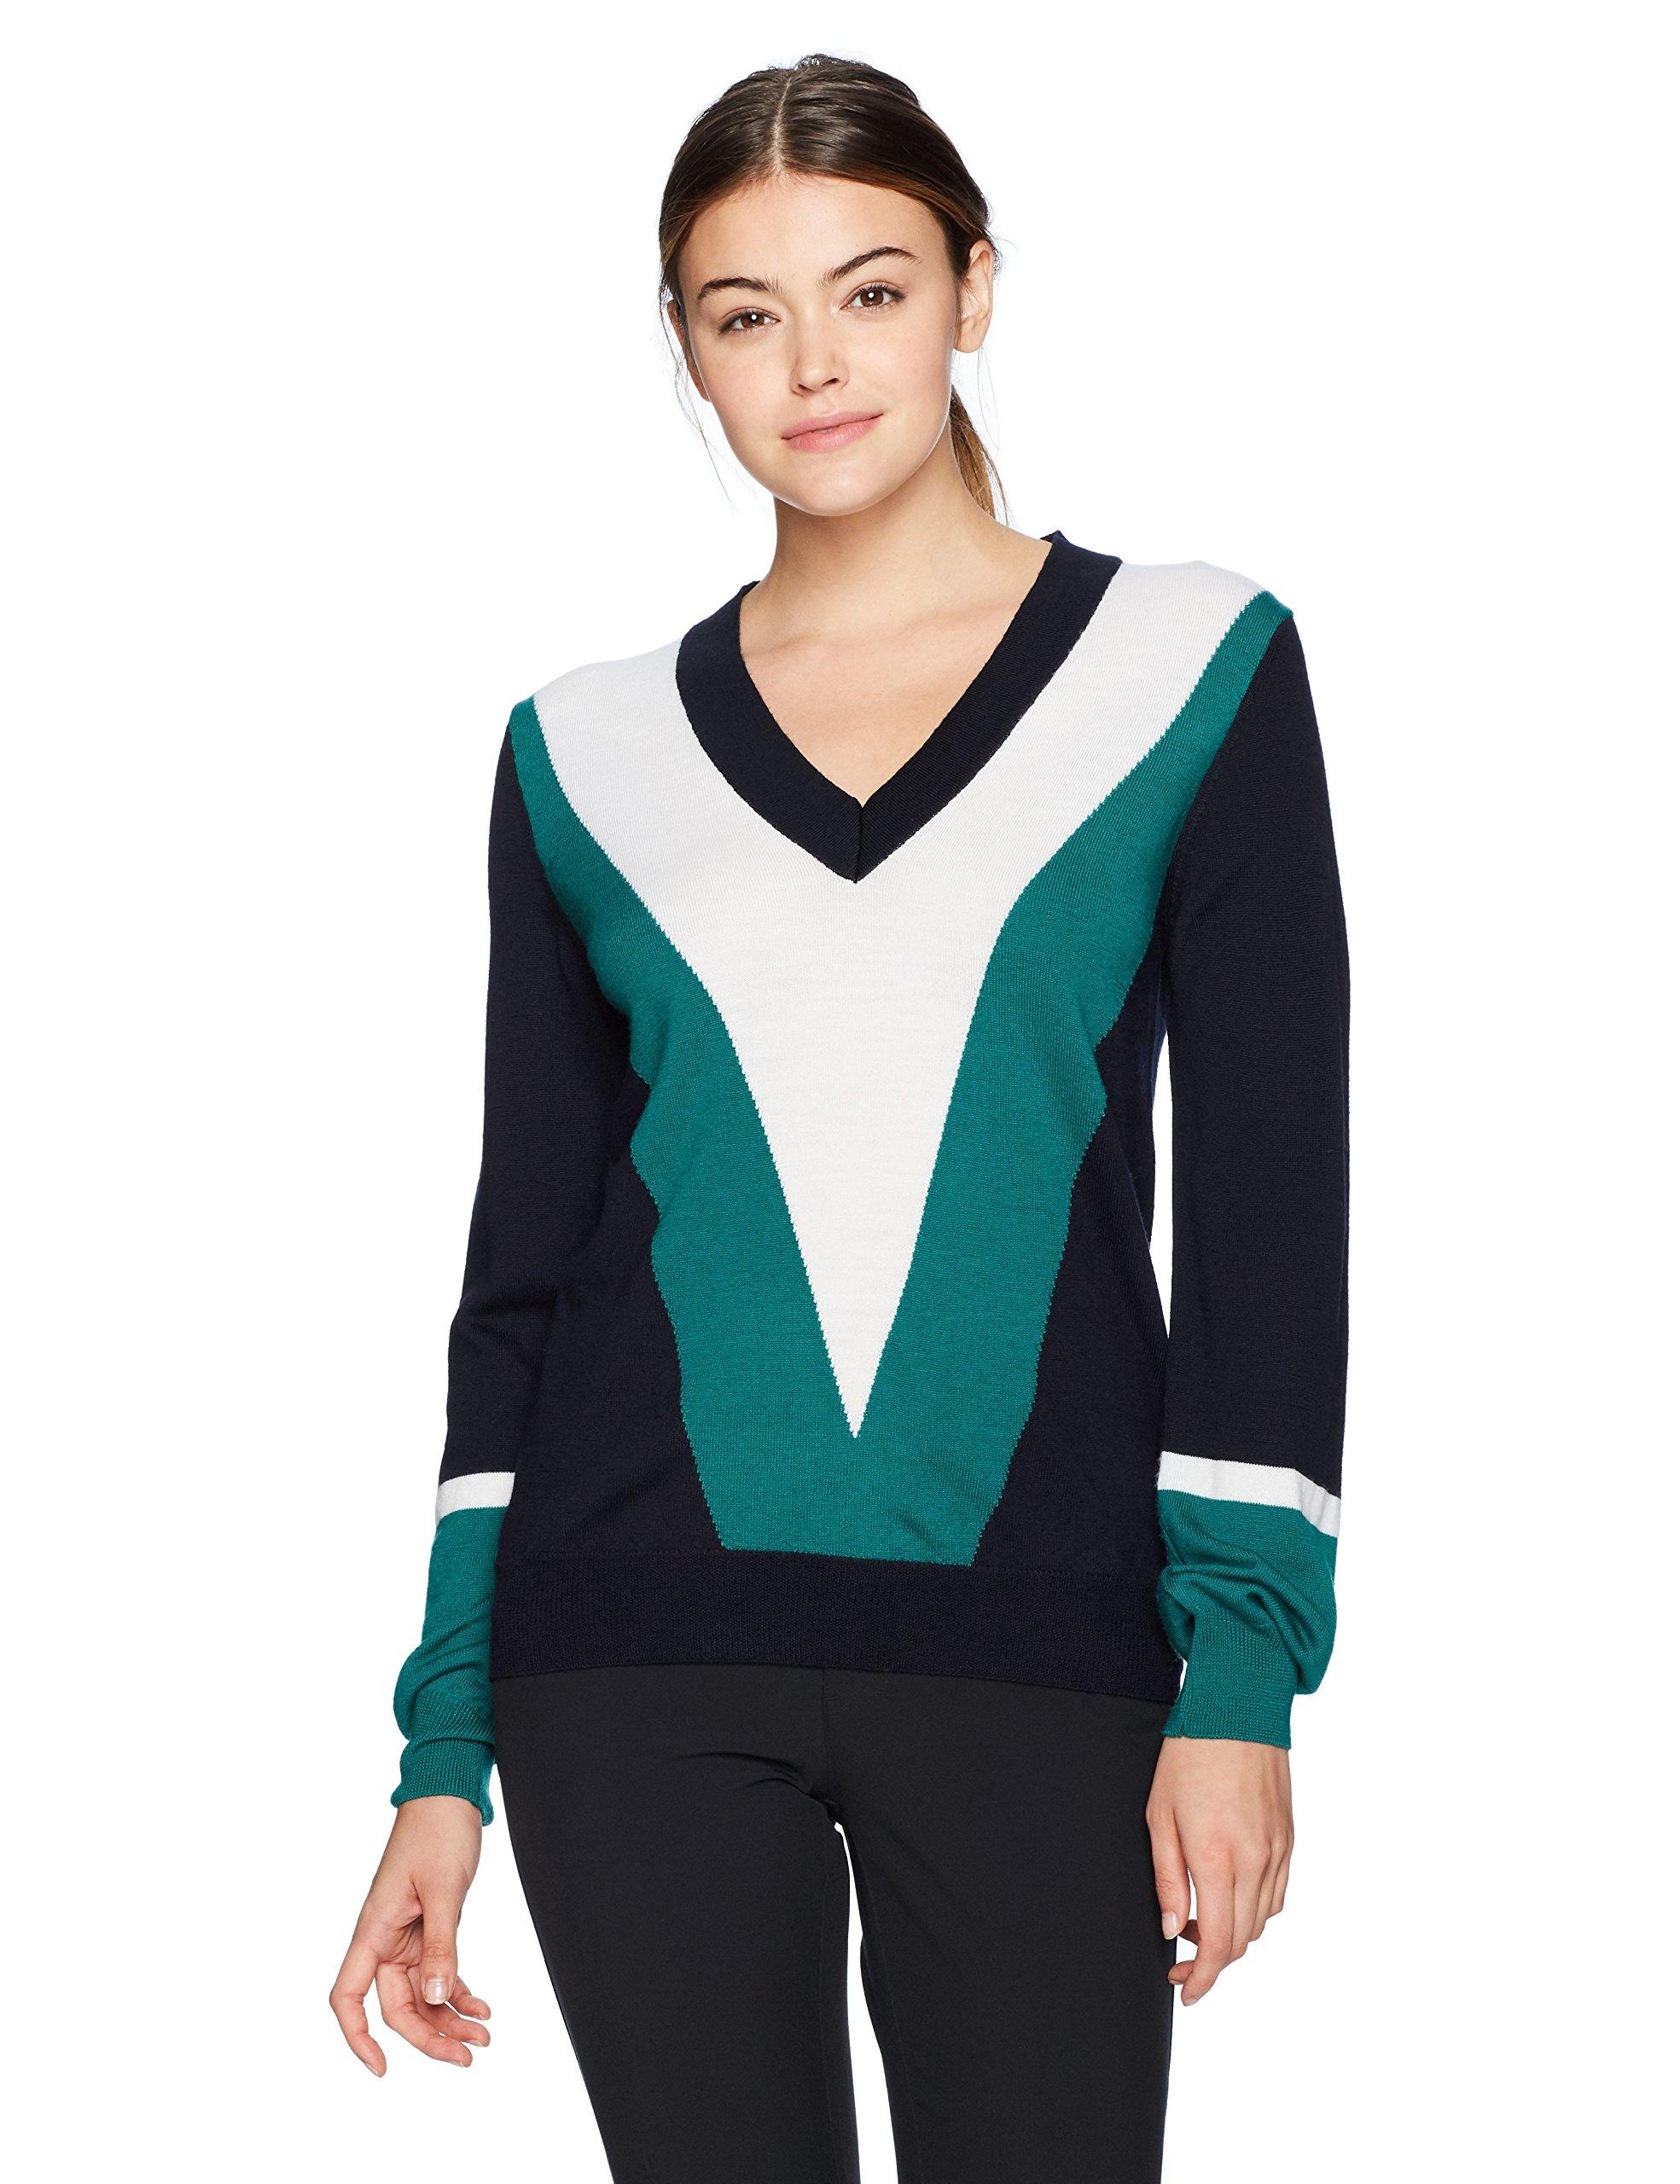 J.Lindeberg Women's W Mona True Merino Sweater, JL Navy, M by J.Lindeberg (Image #1)